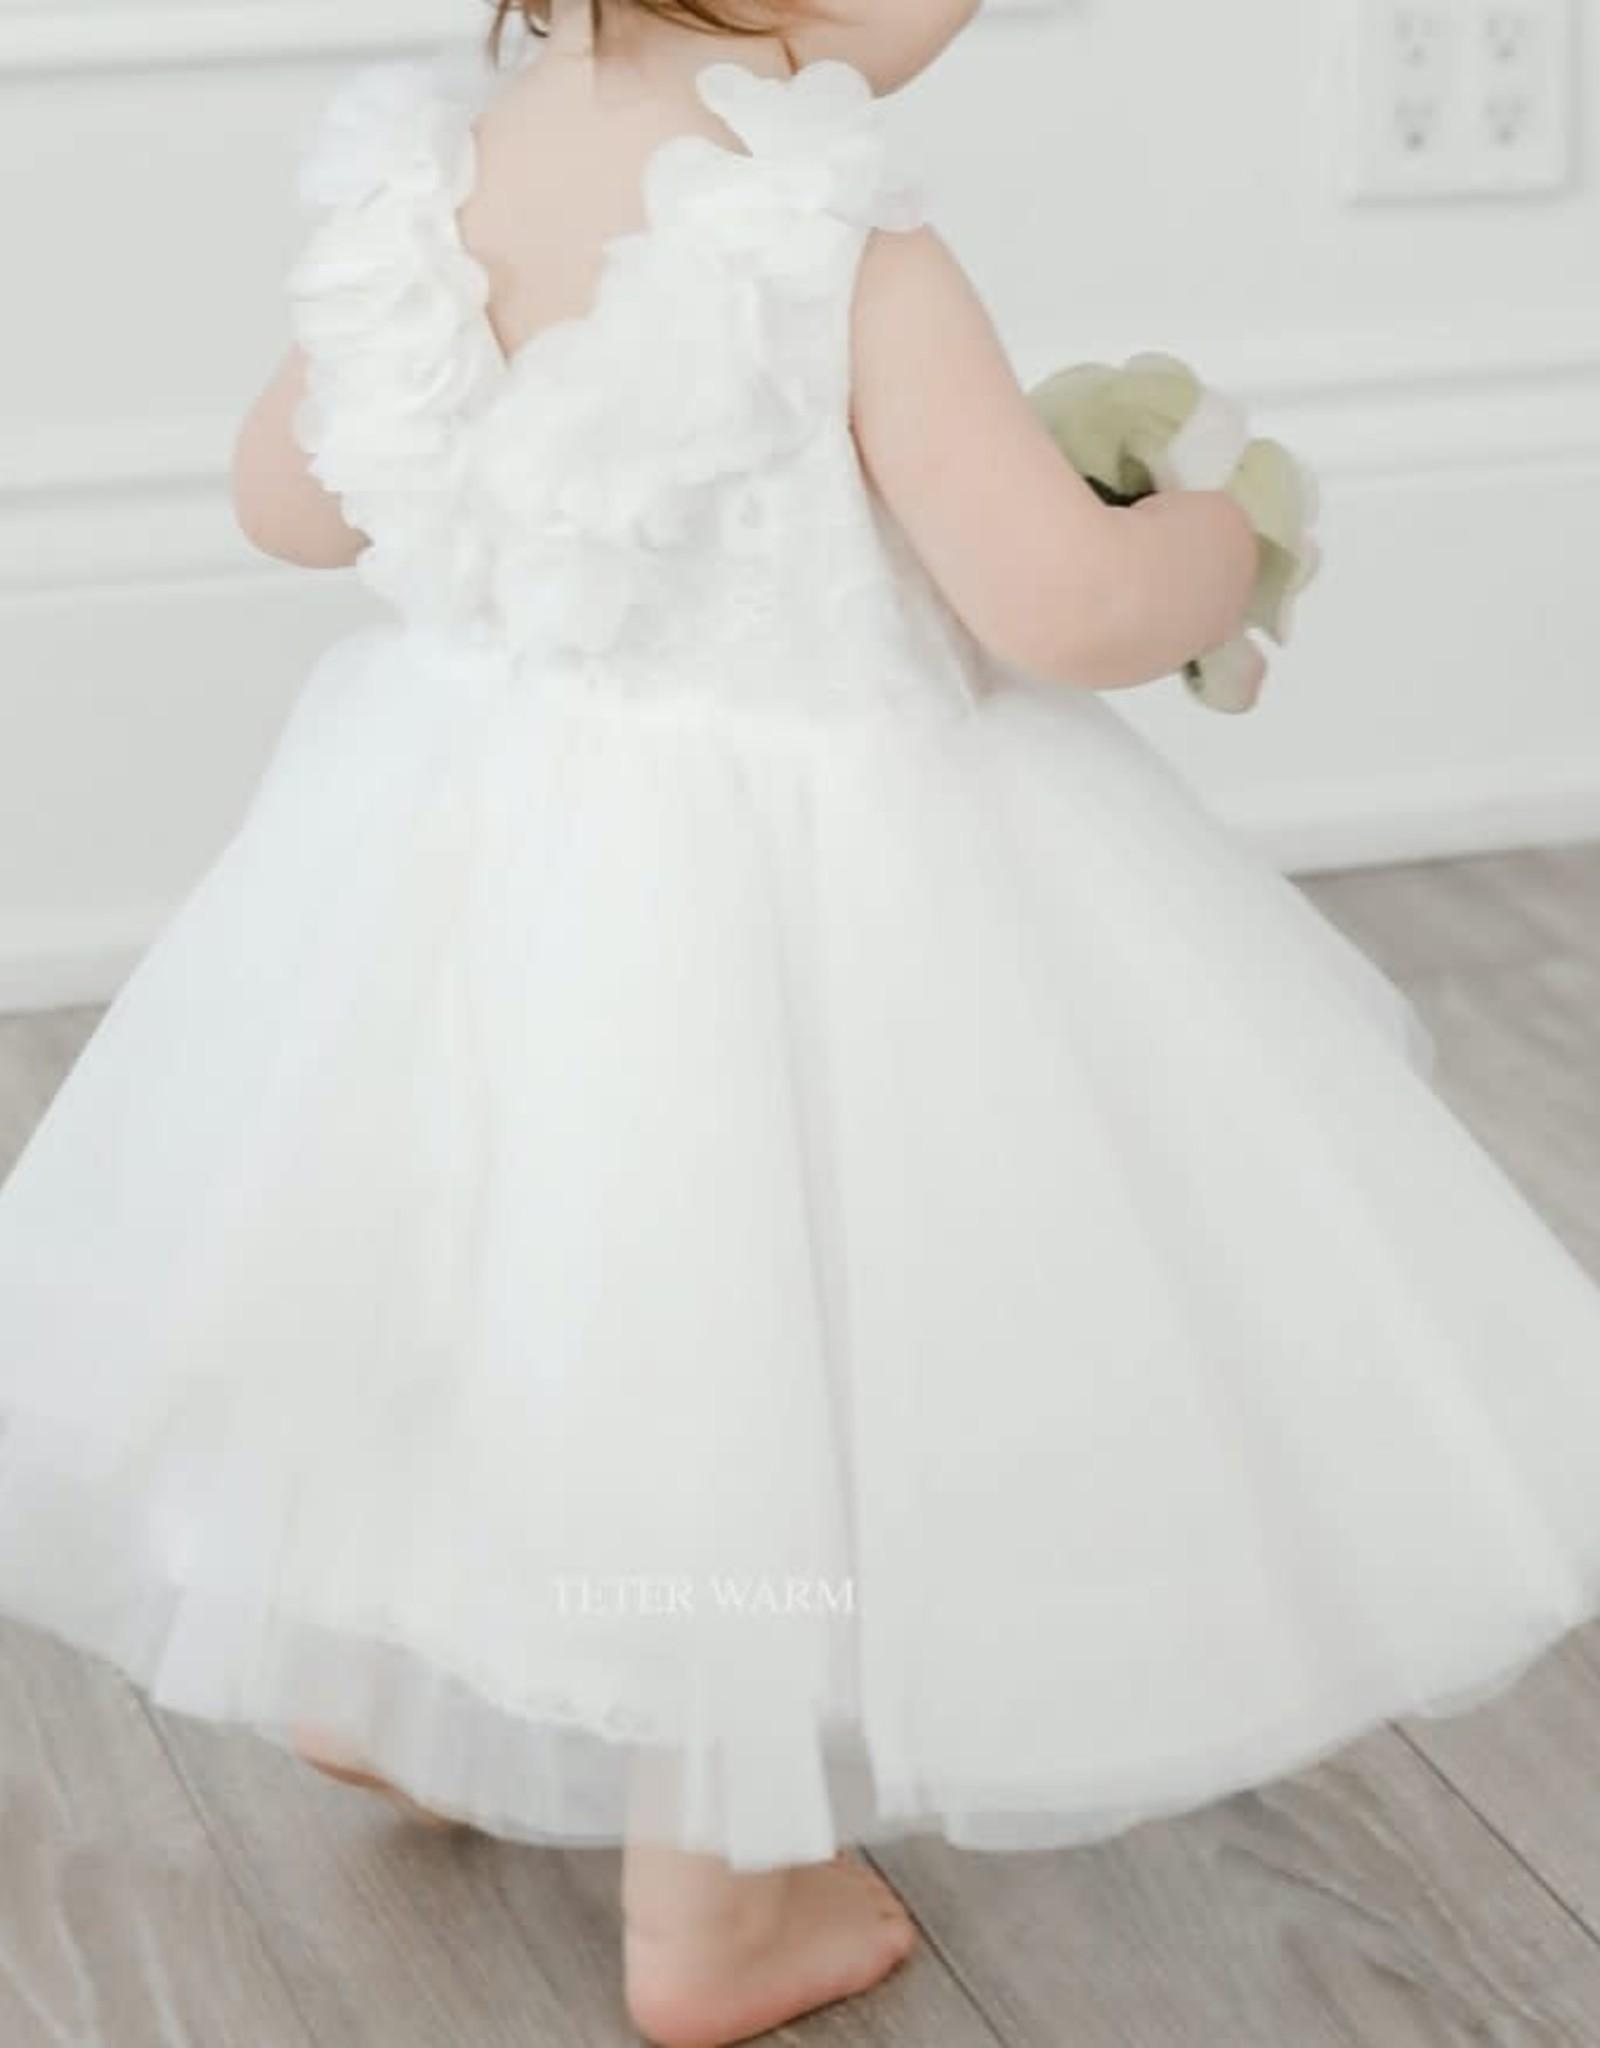 Teter Warm Flower V-Back Dress